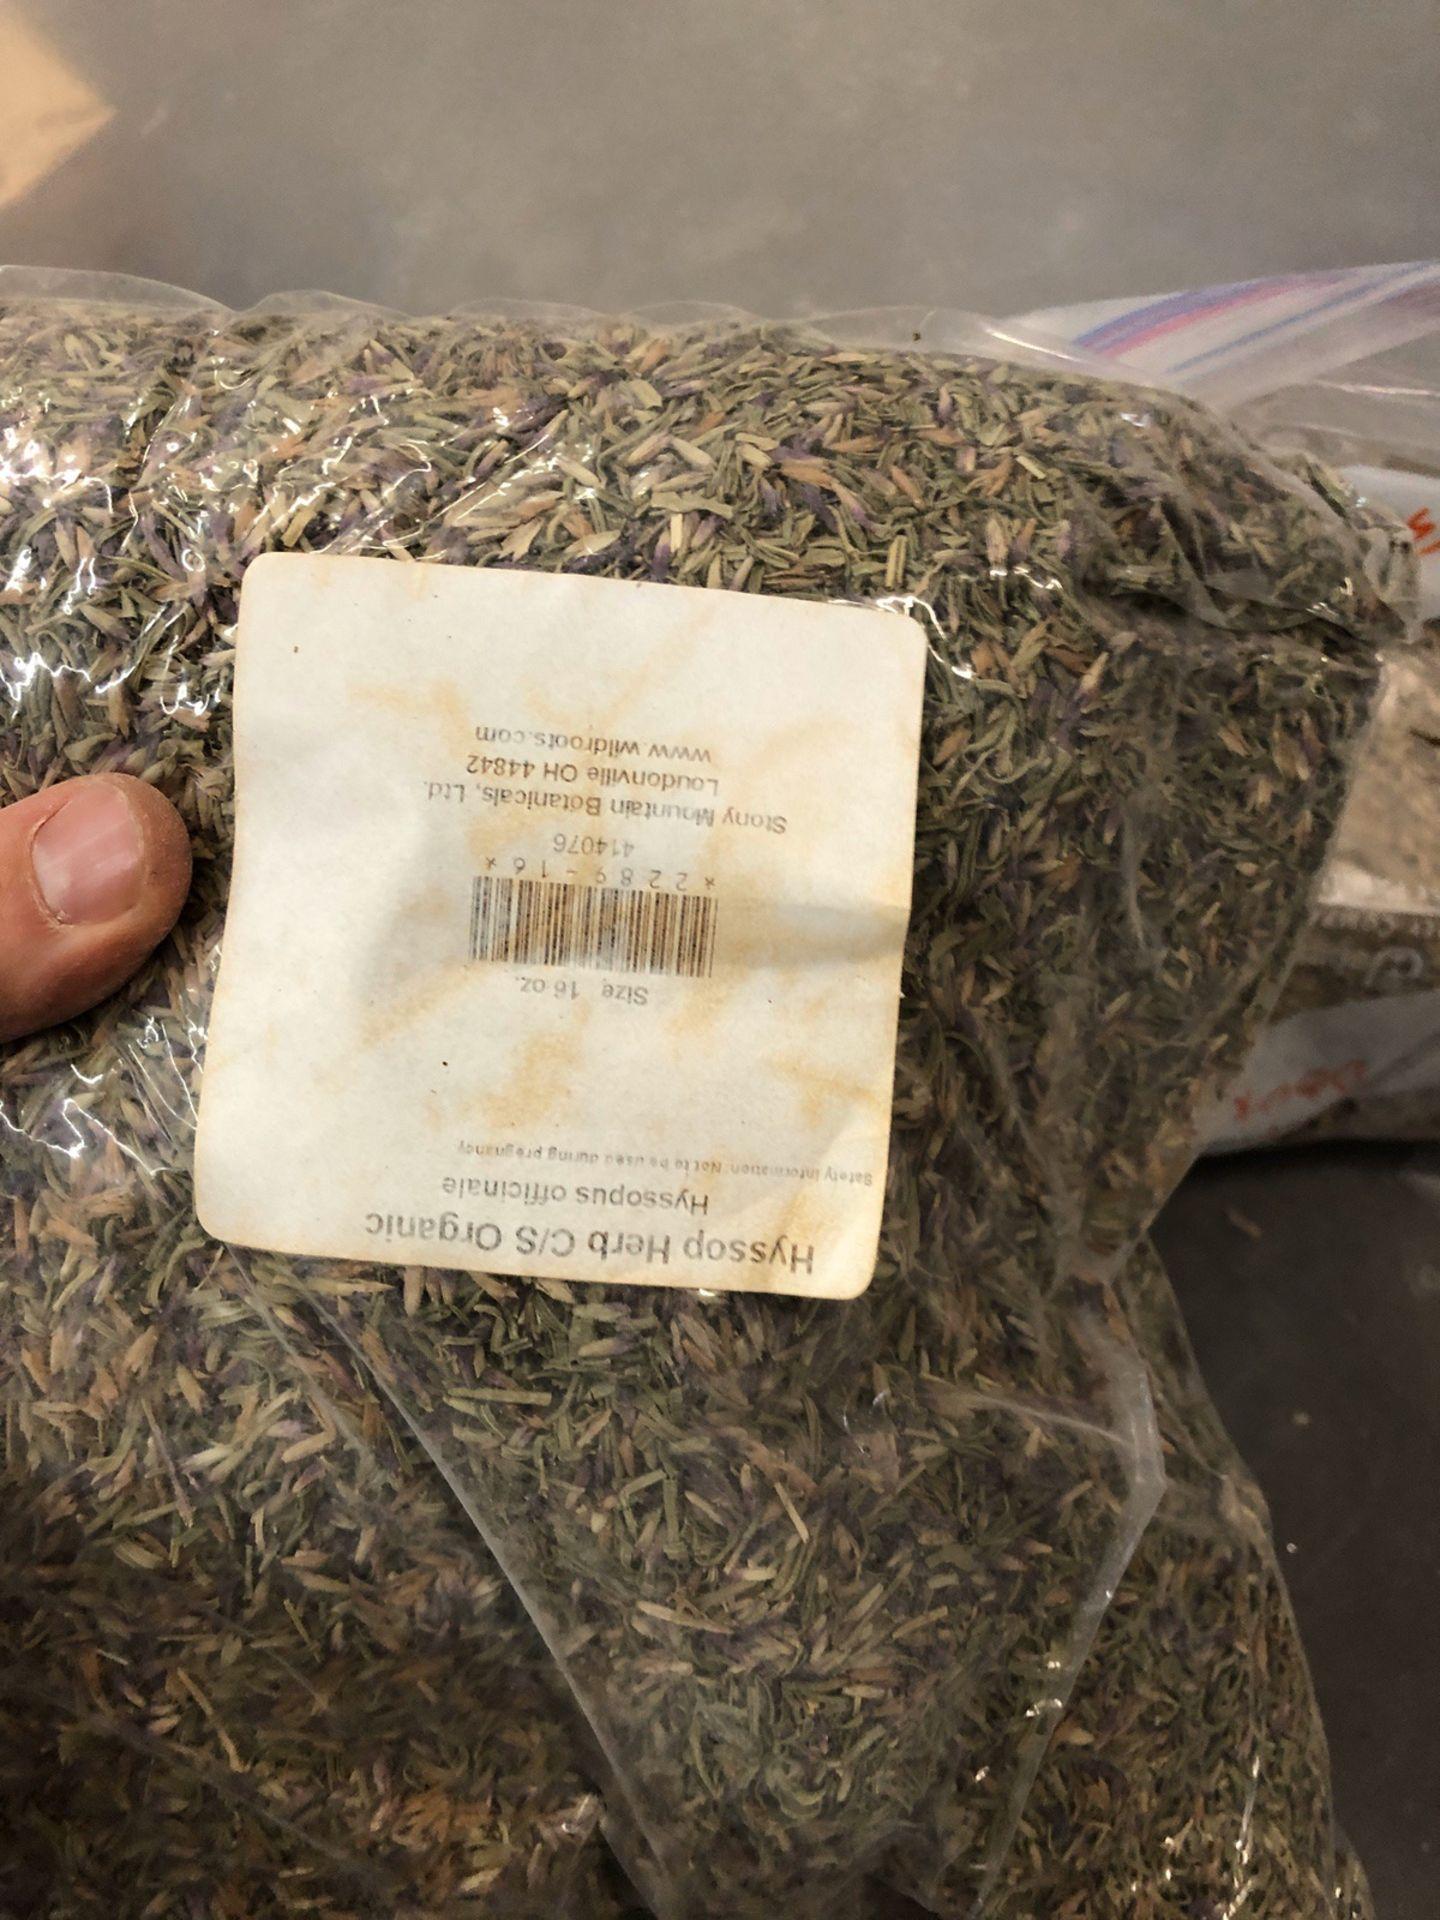 Lot 109 - Lot of Herbs and Botanicals: Orange Peel, Peppermint Leaf, Cinchona Bark, Caraw   Rig Fee: $20 or HC